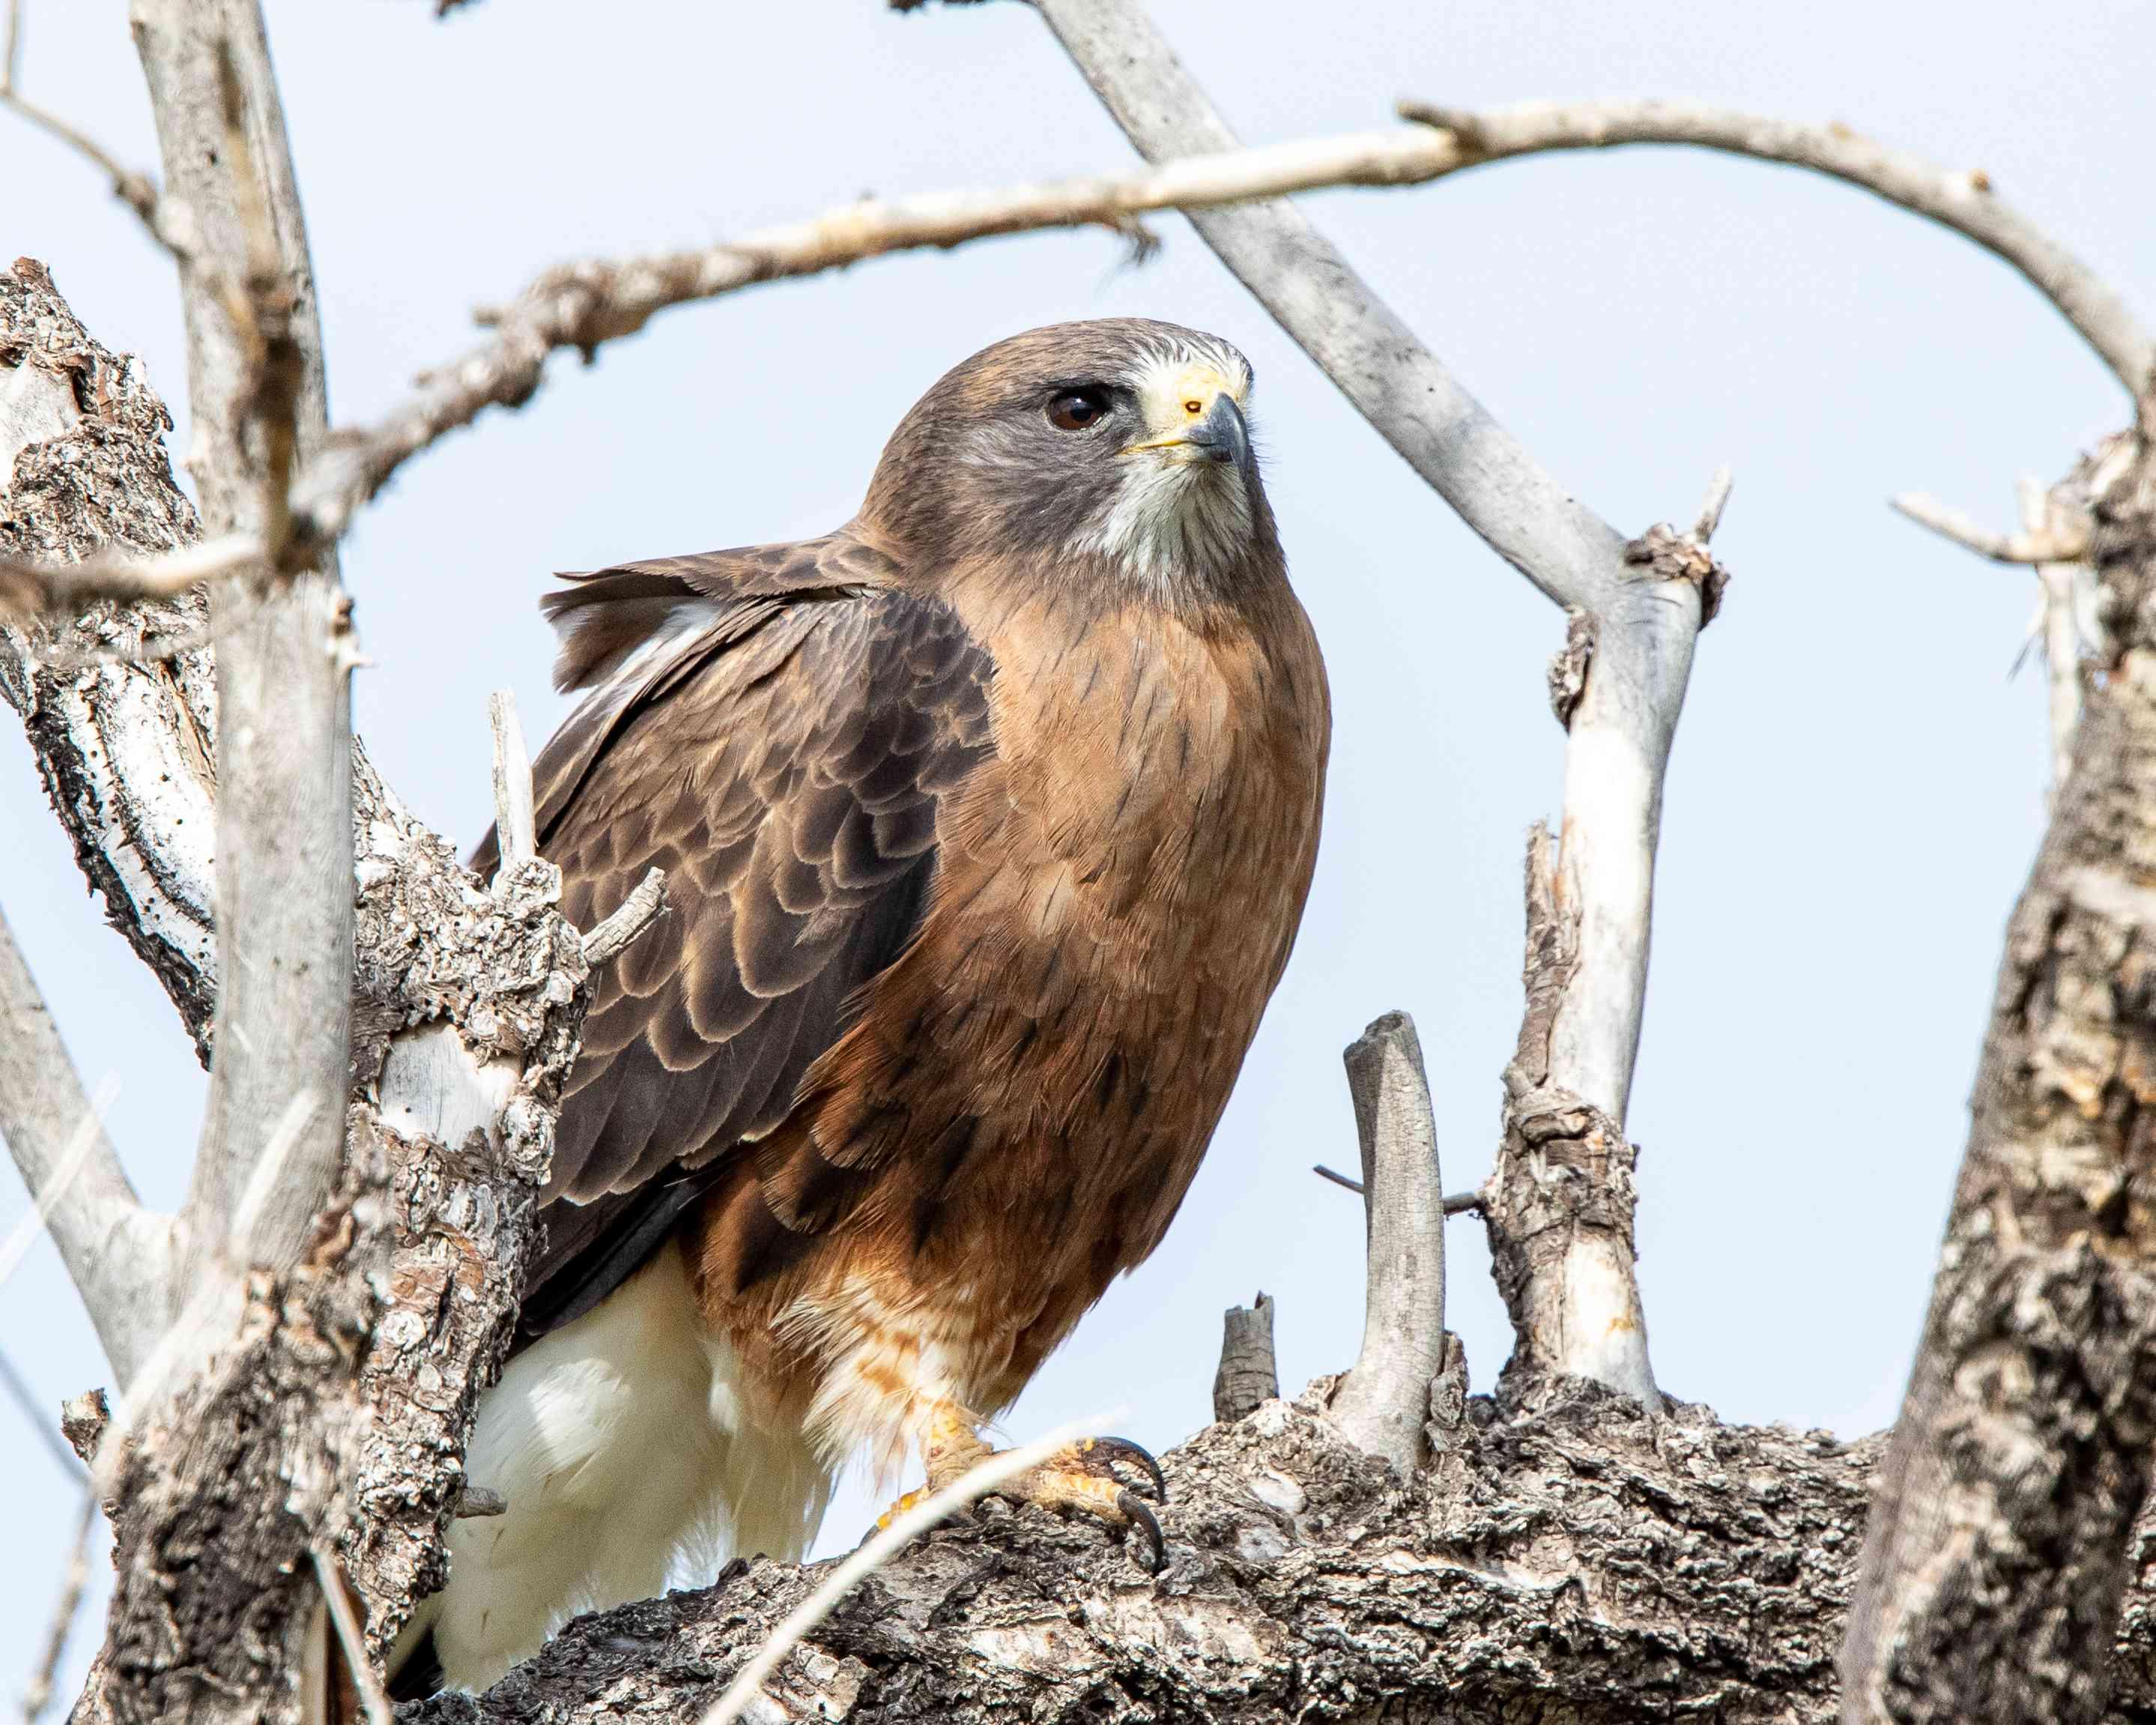 Portrait of a Swainson's Hawk